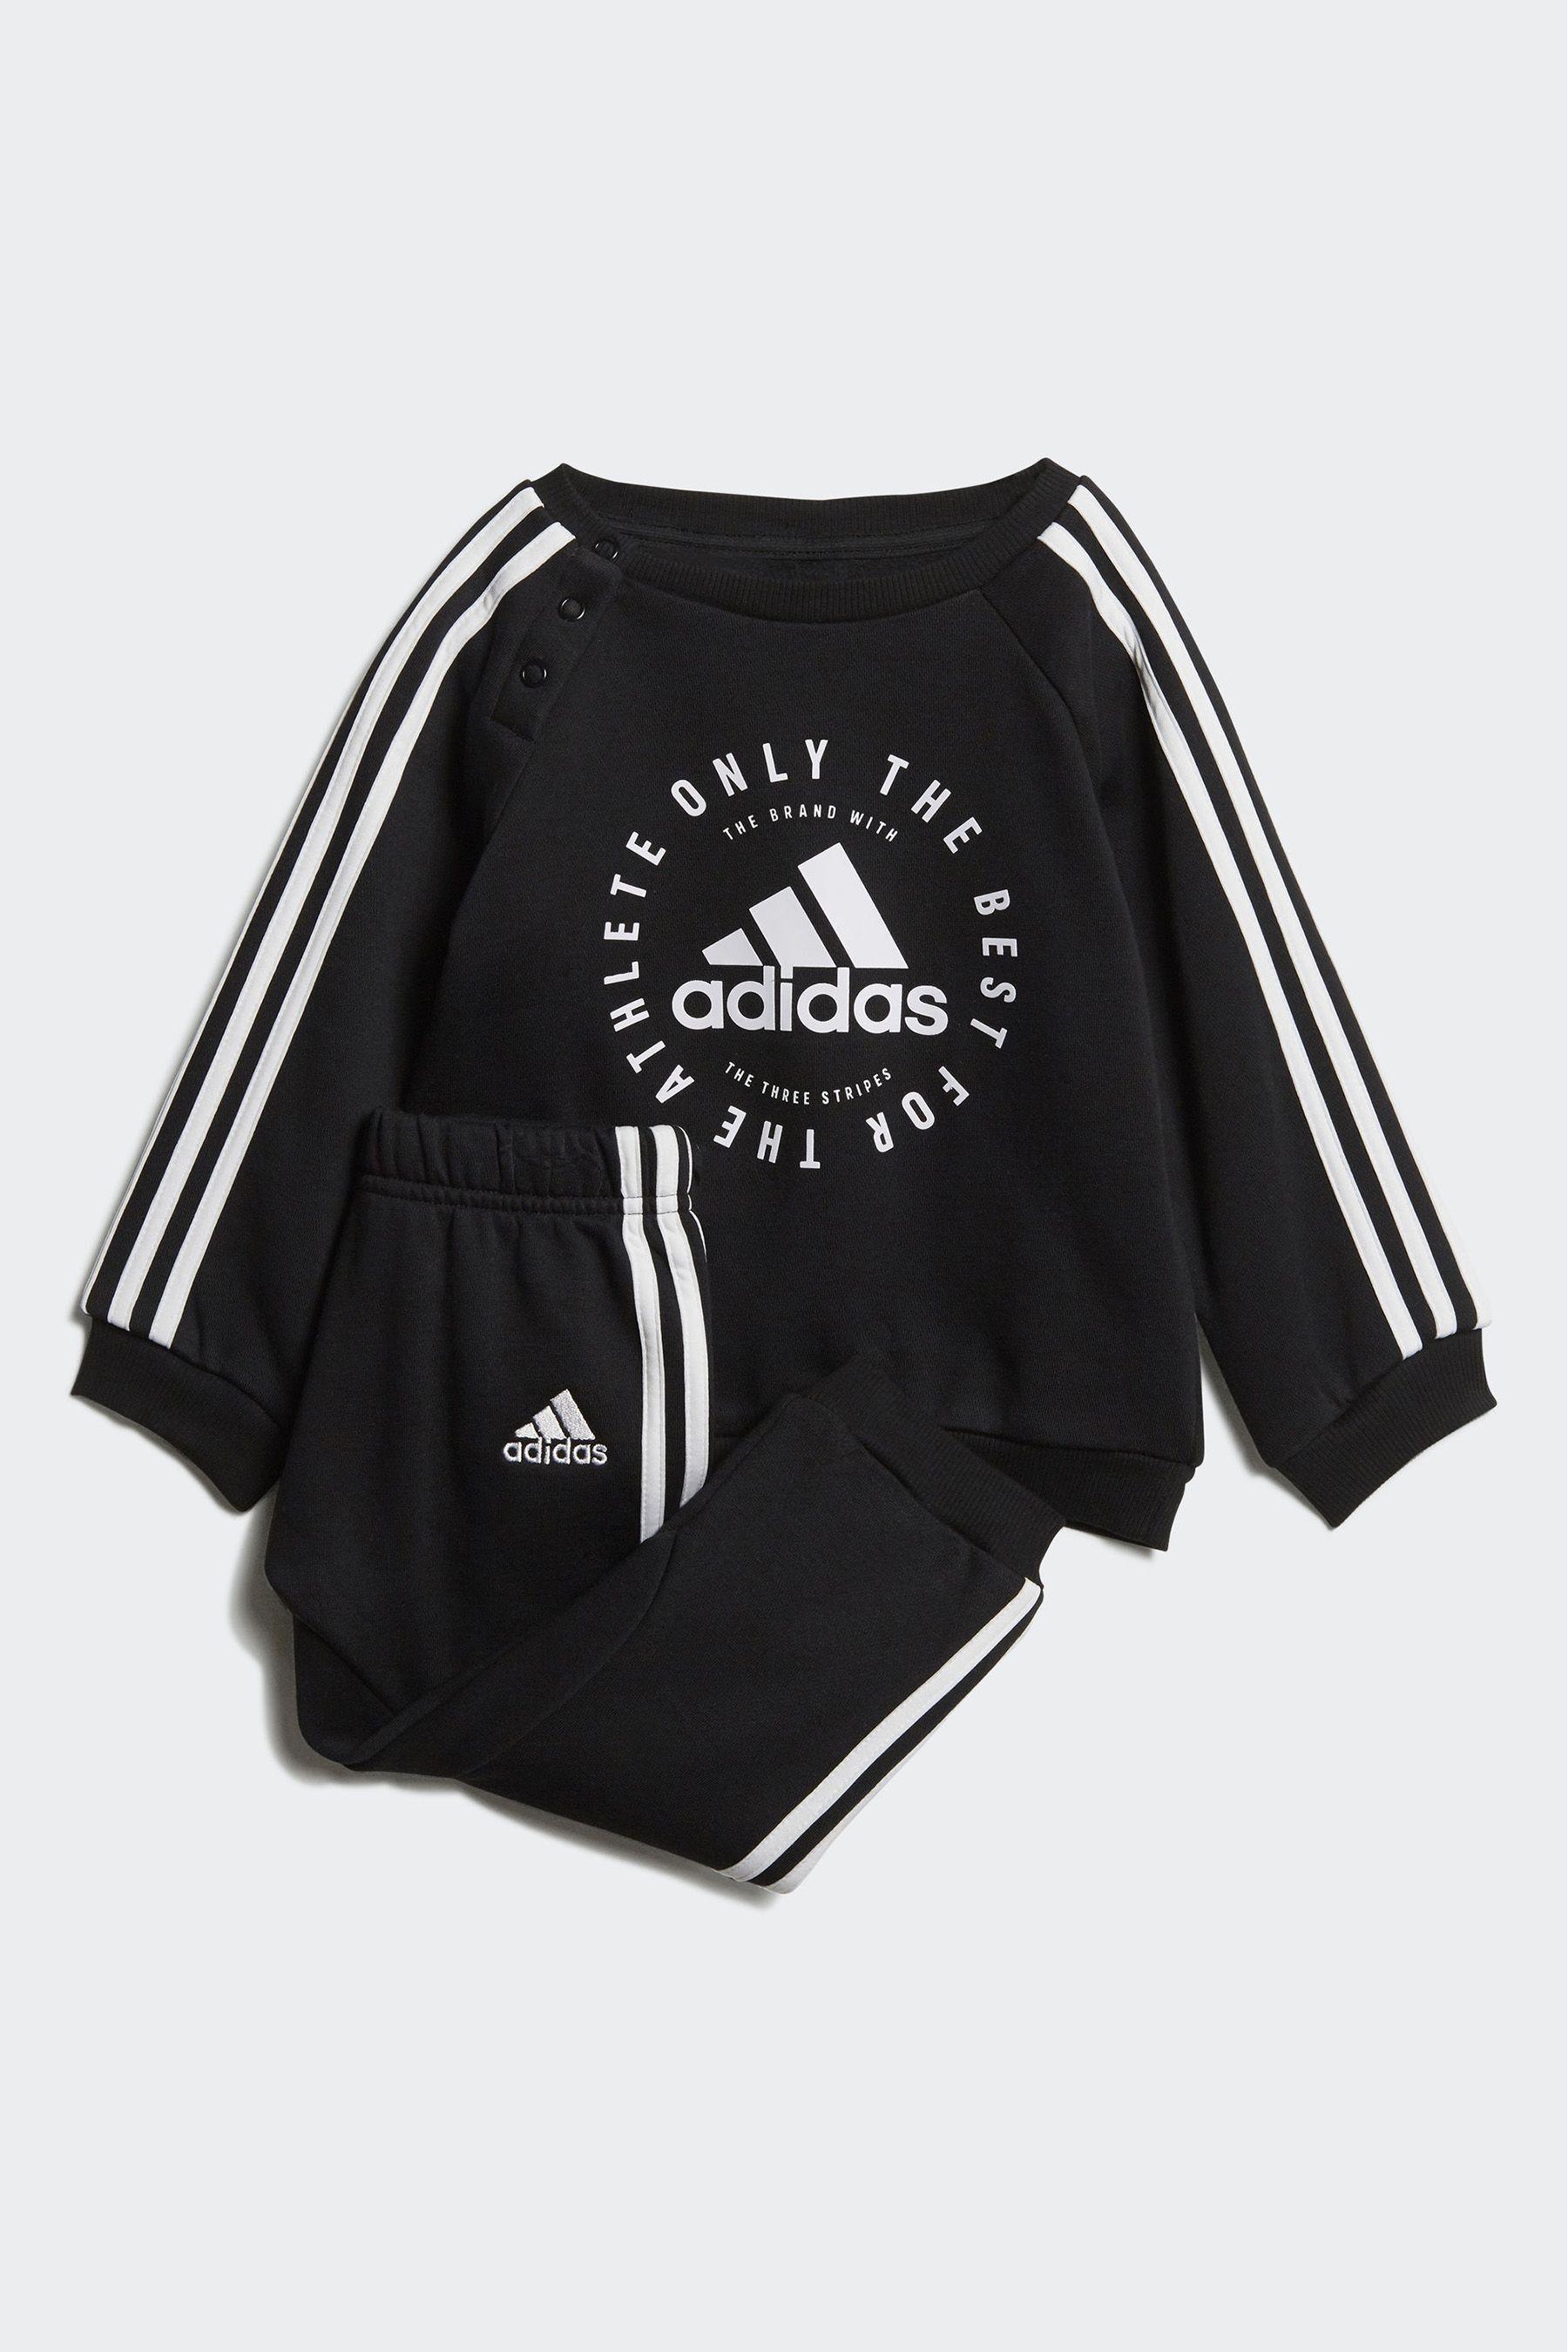 adidas fleece 3-stripes jogger set